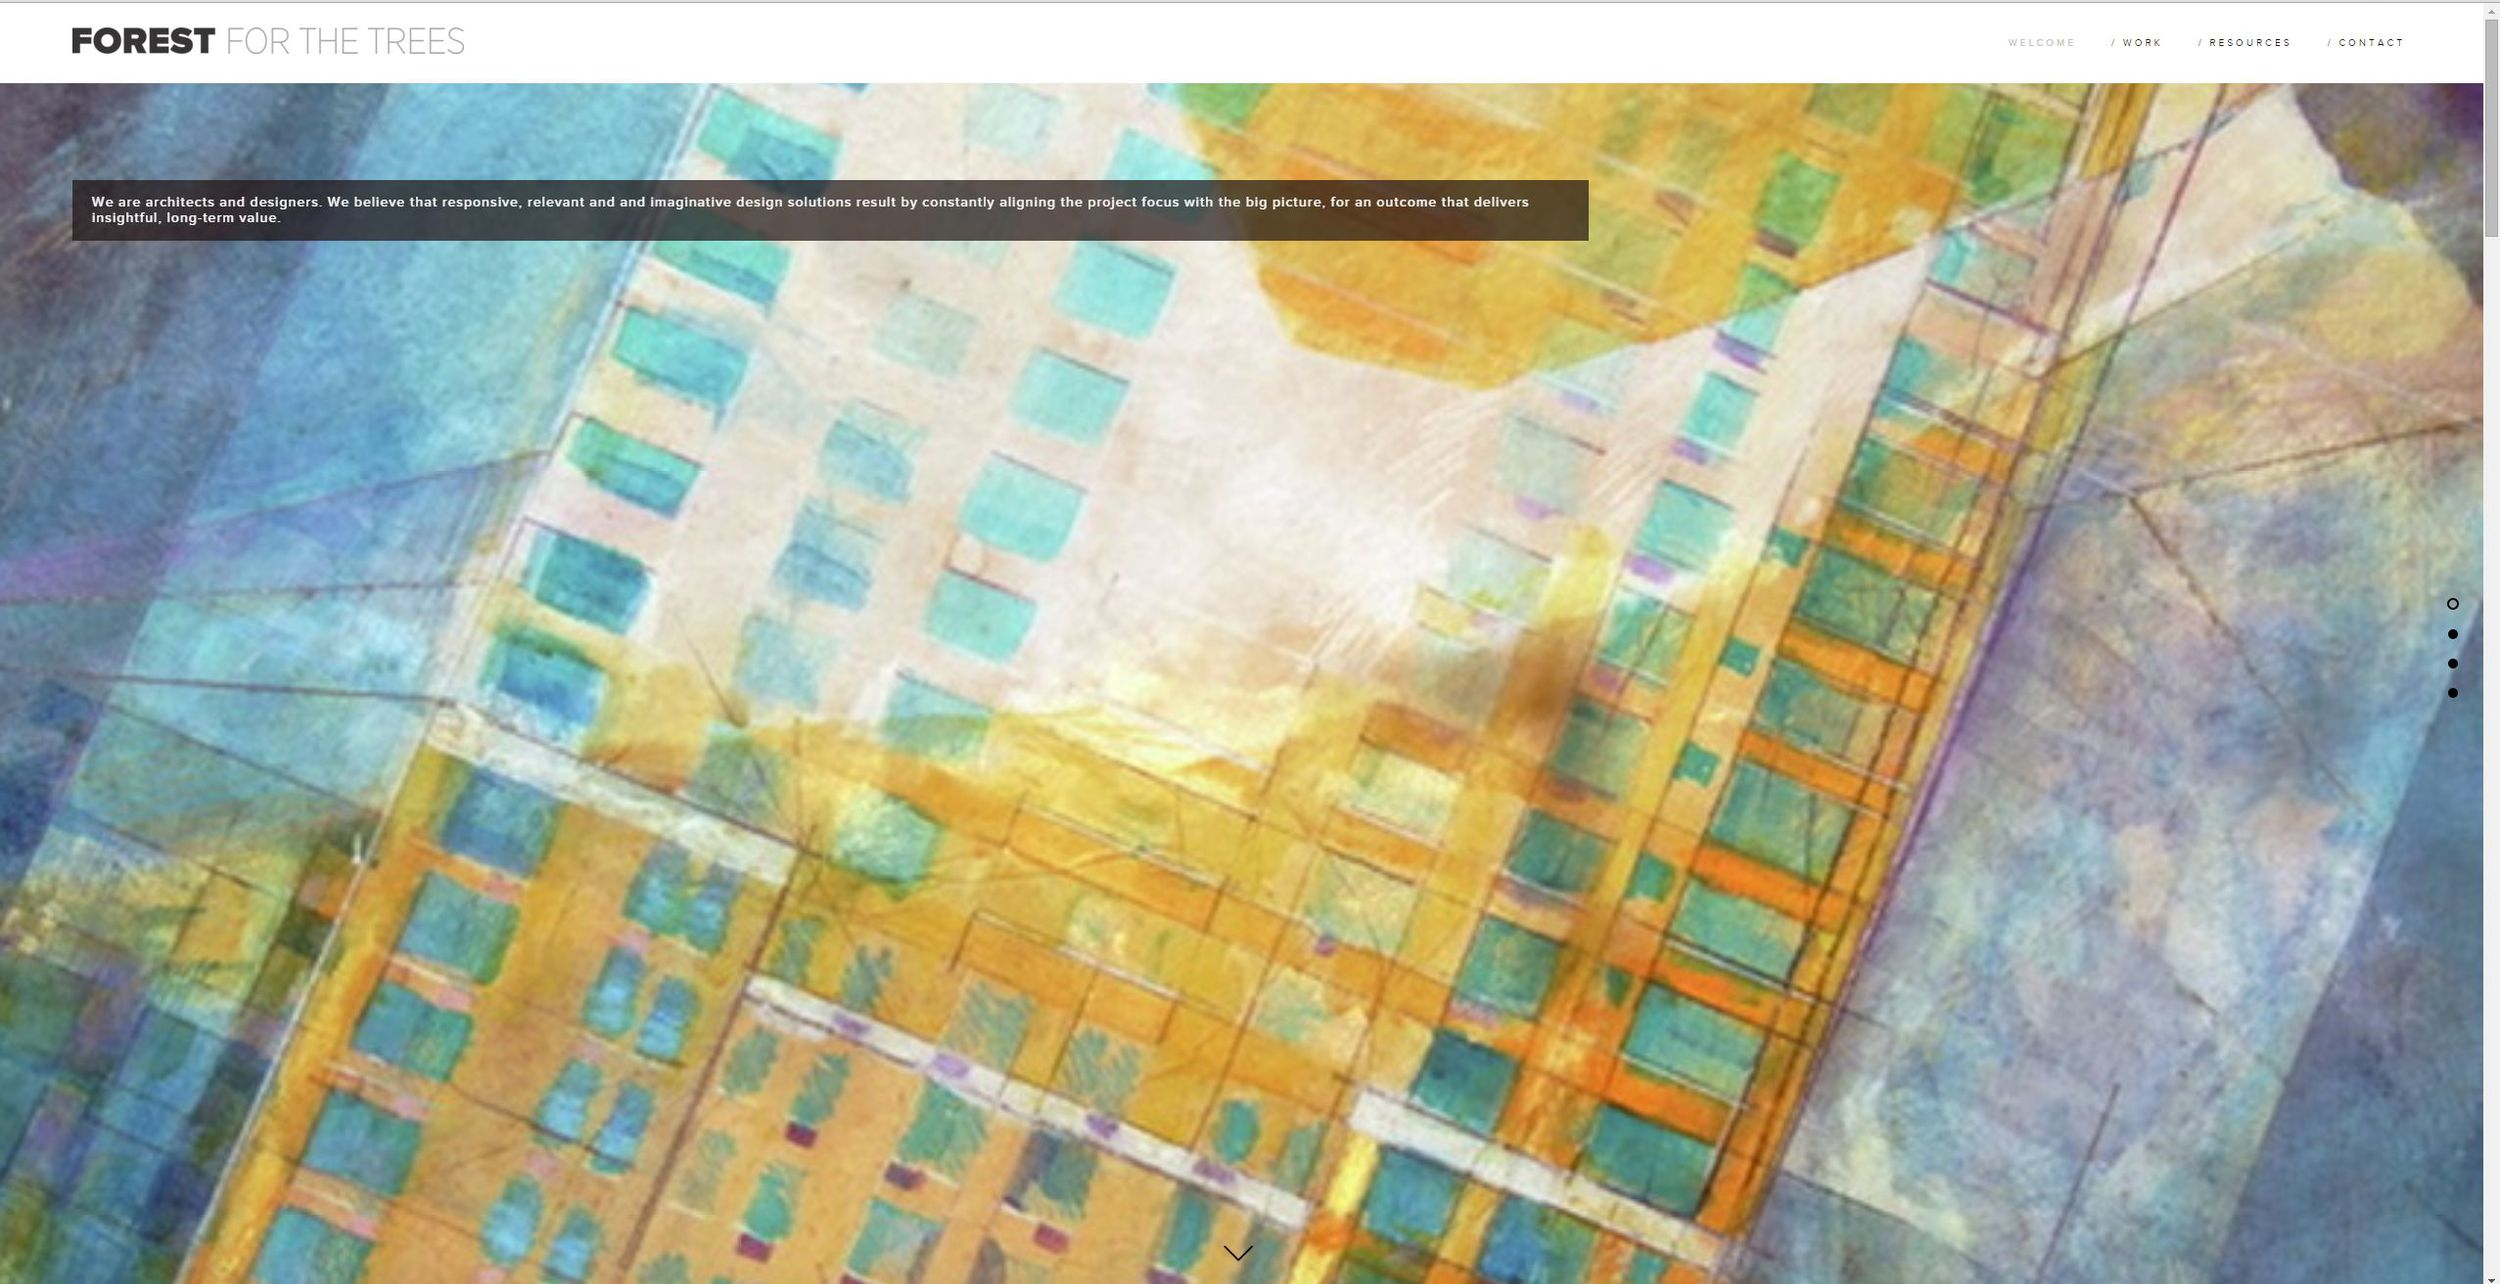 Bitmap in website.jpg